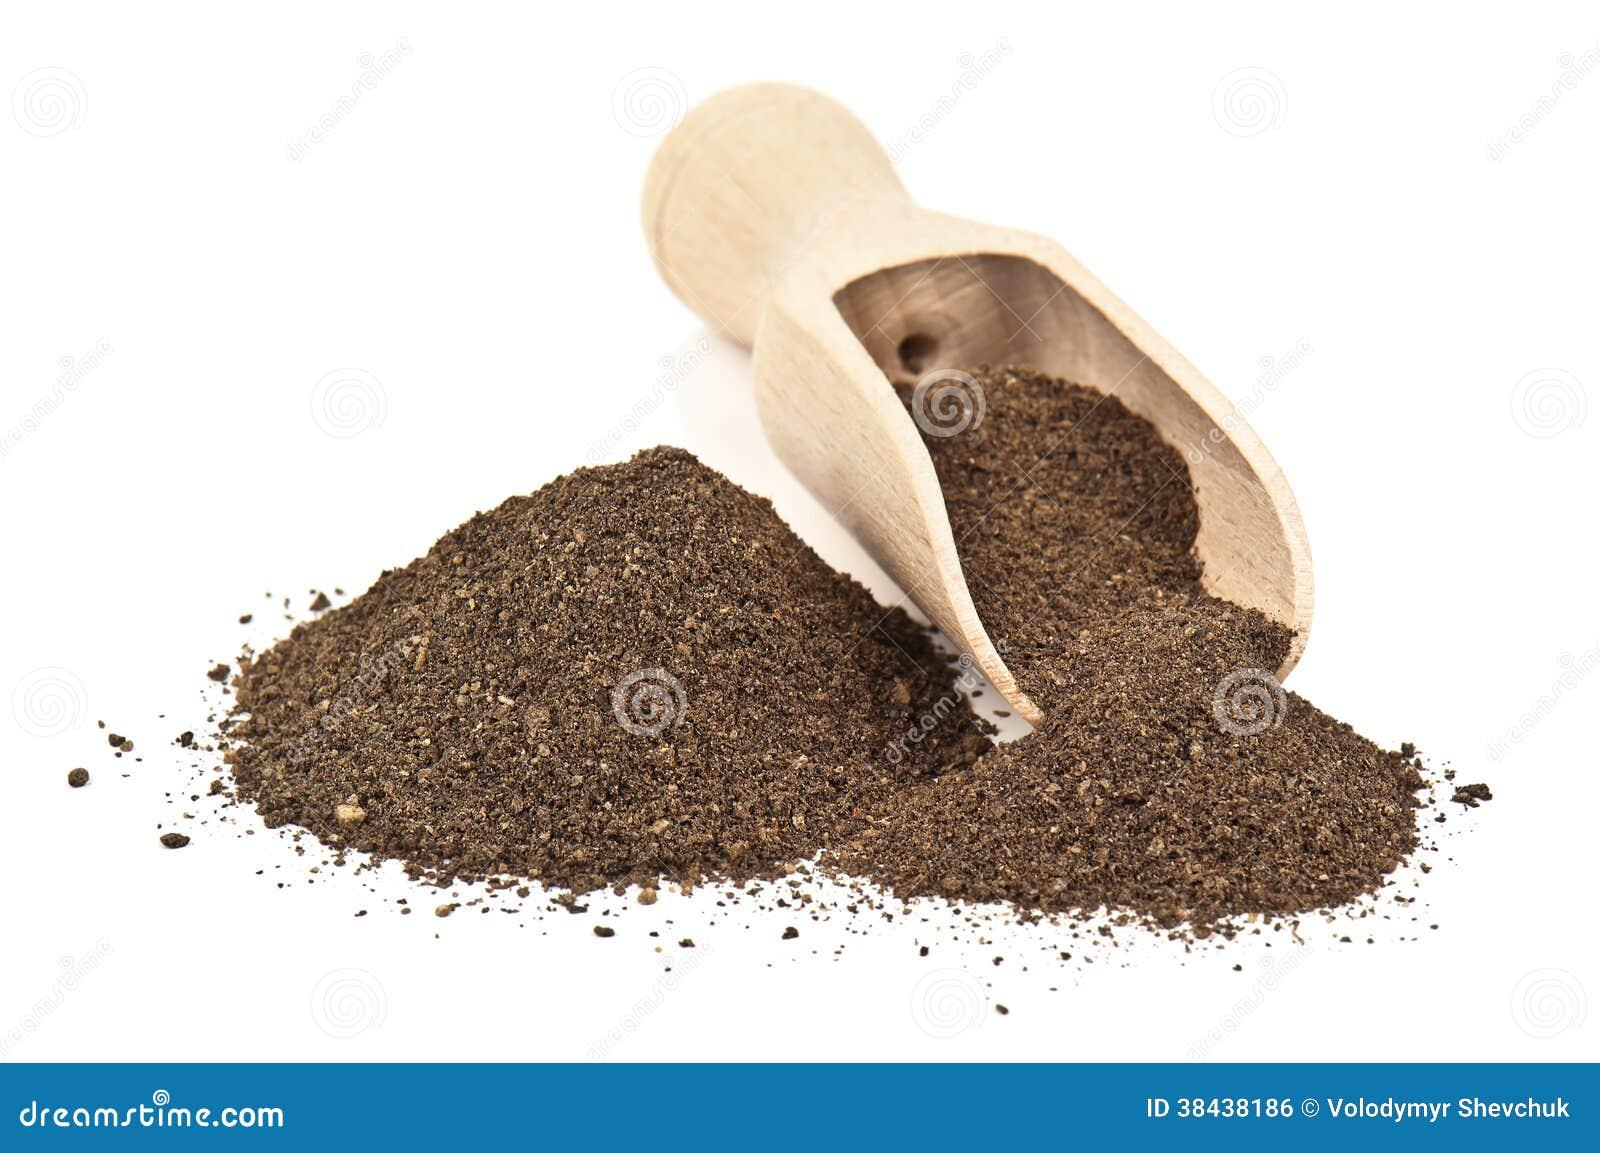 Pepper ground